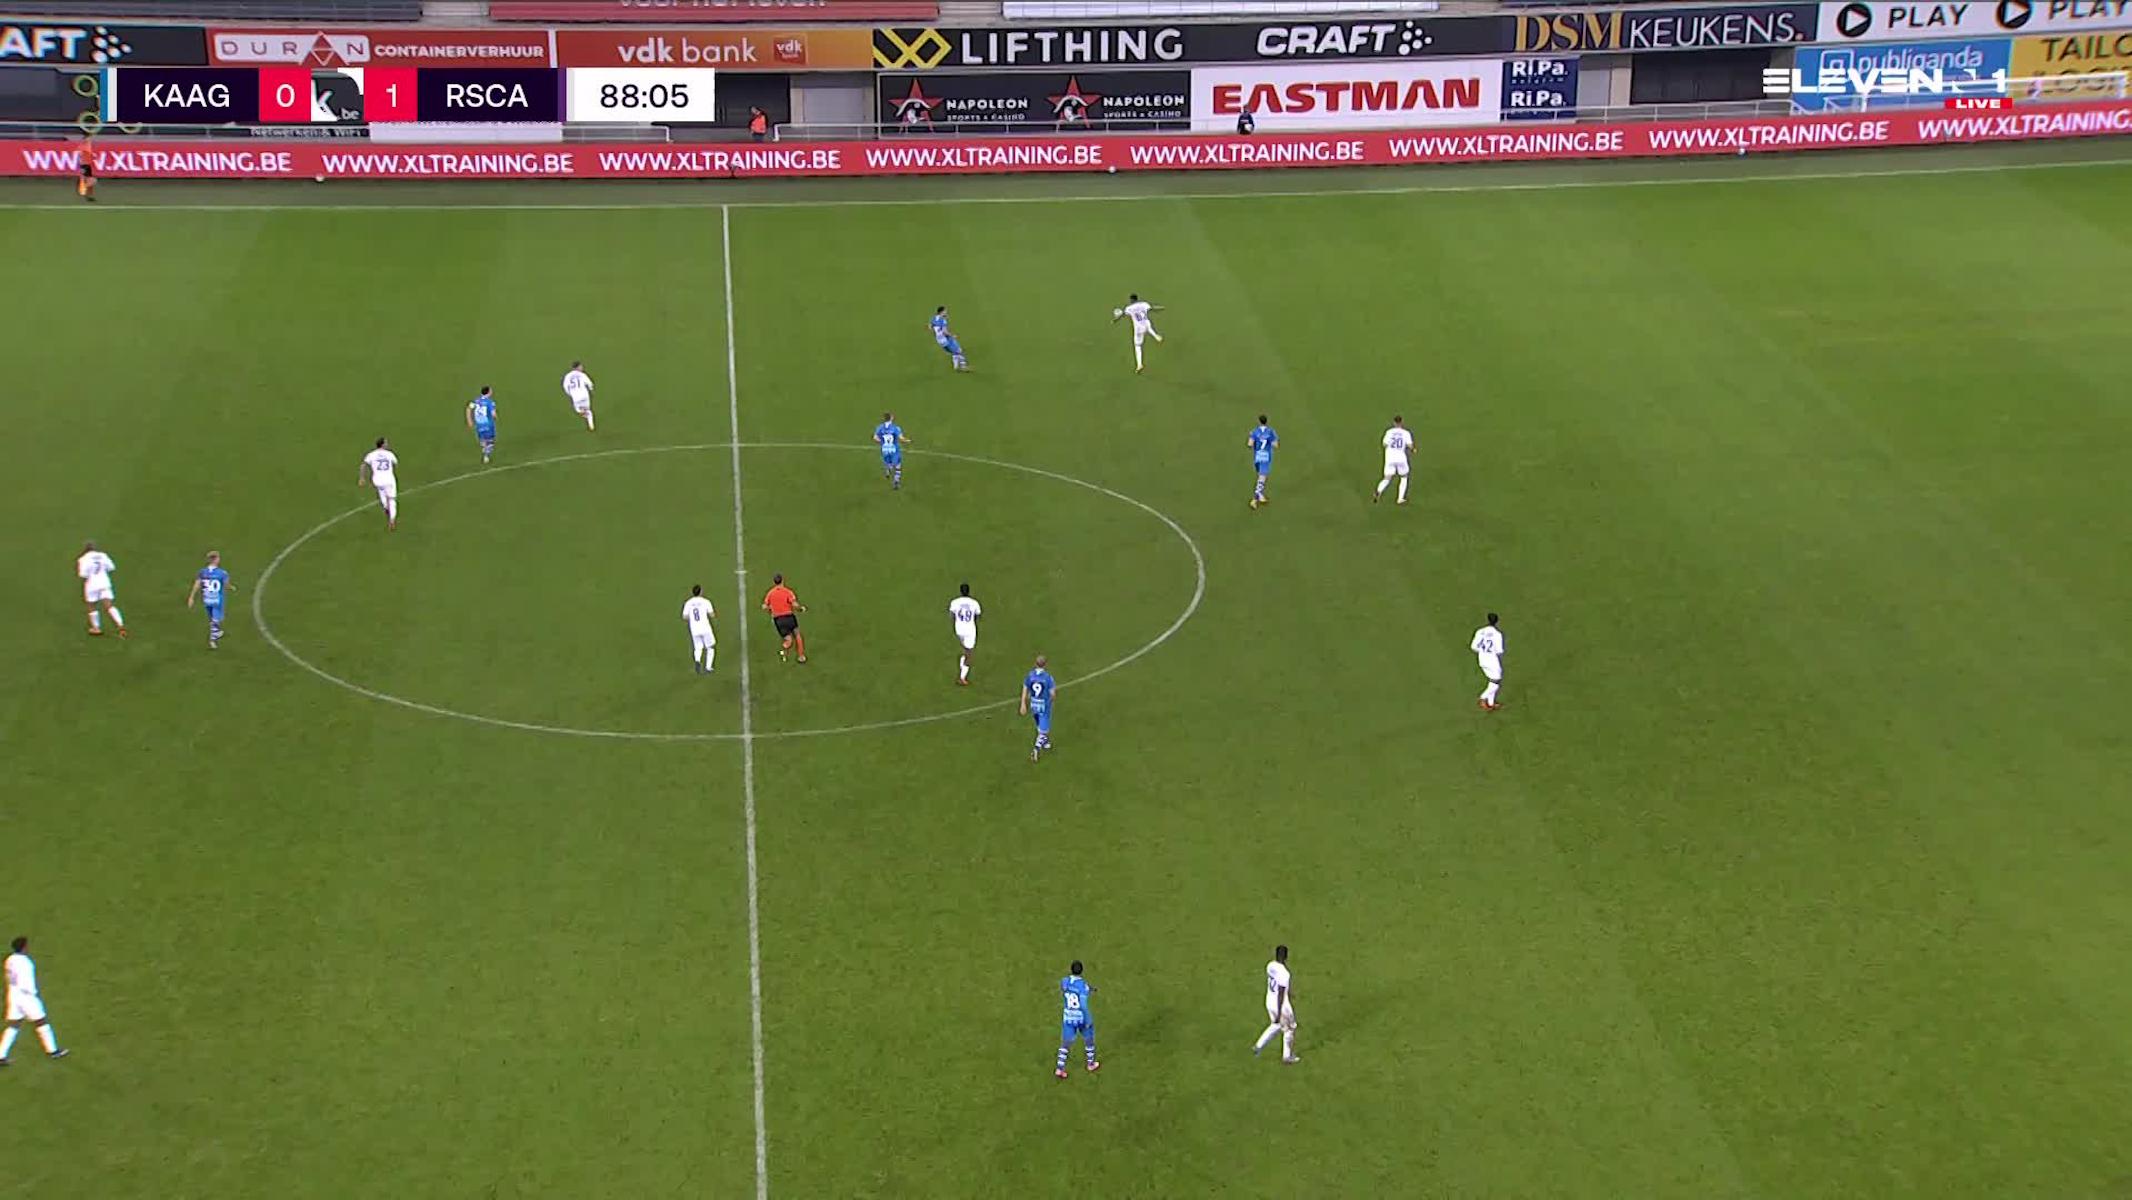 Doelpunt Roman Yaremchuk (KAA Gent vs. RSC Anderlecht)